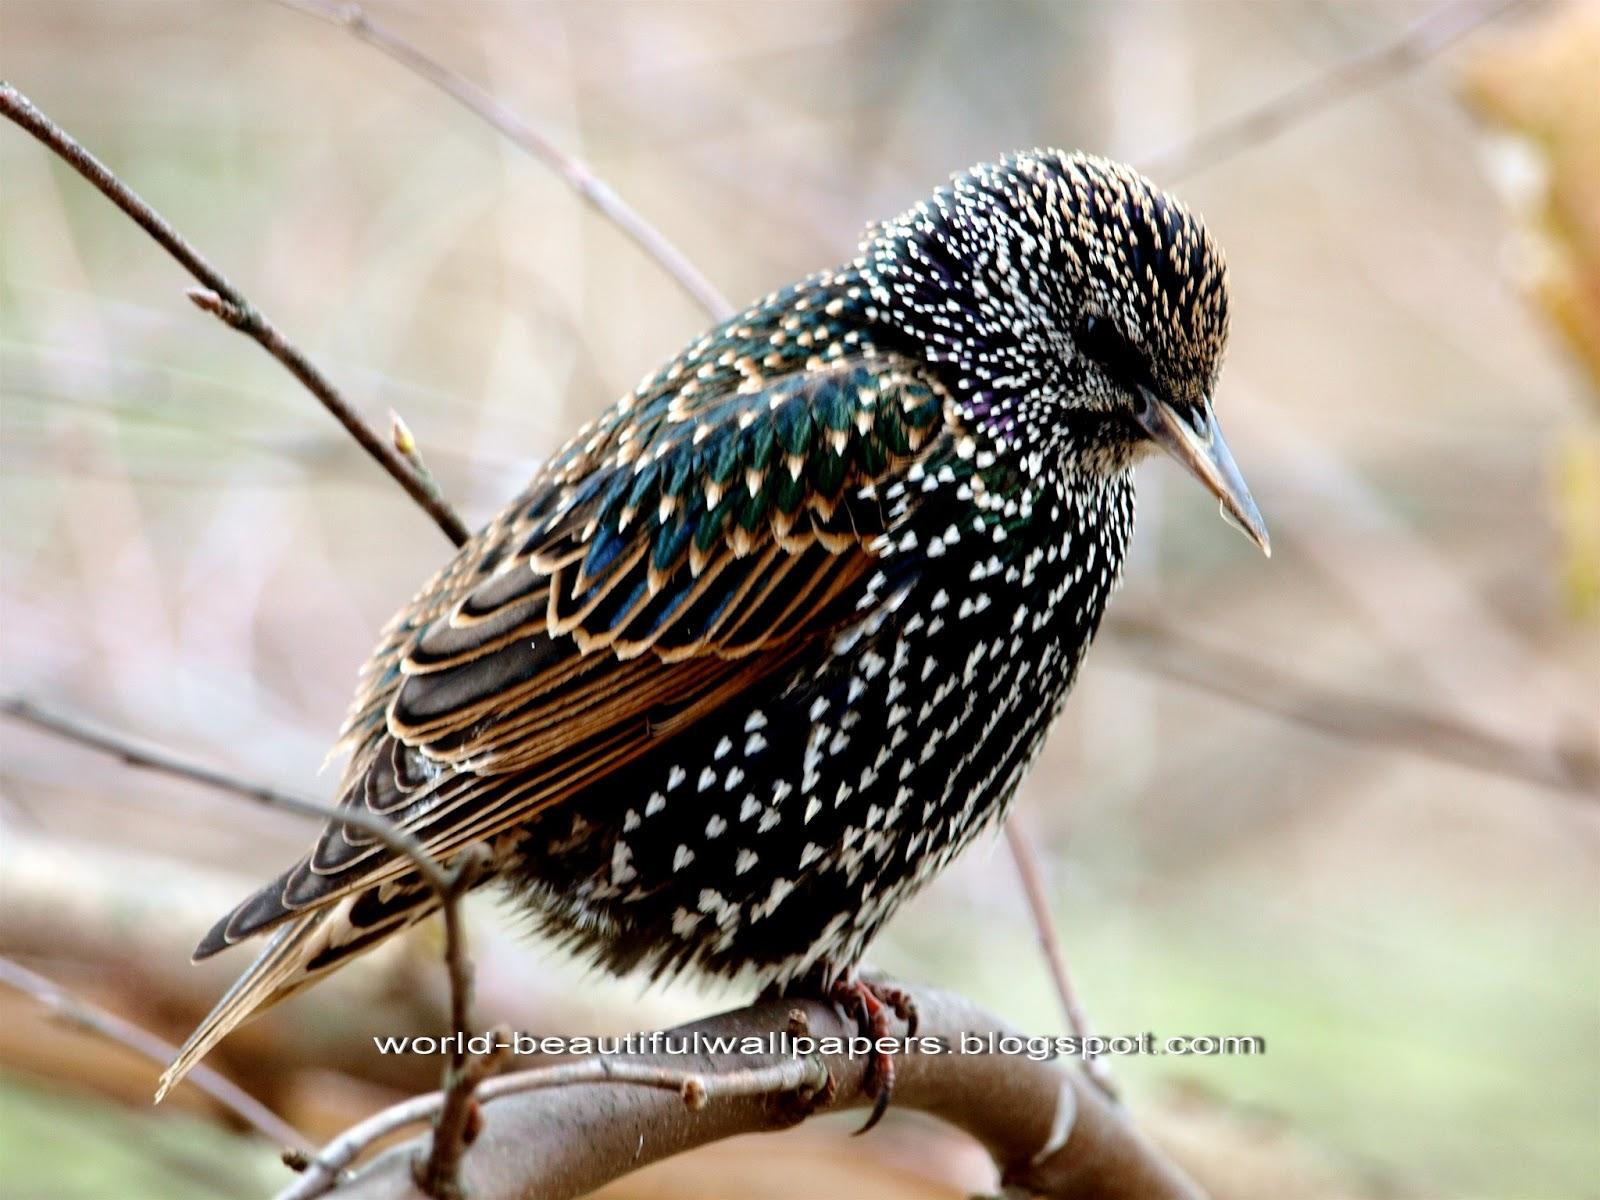 Beautiful Wallpapers: starling bird wallpaper